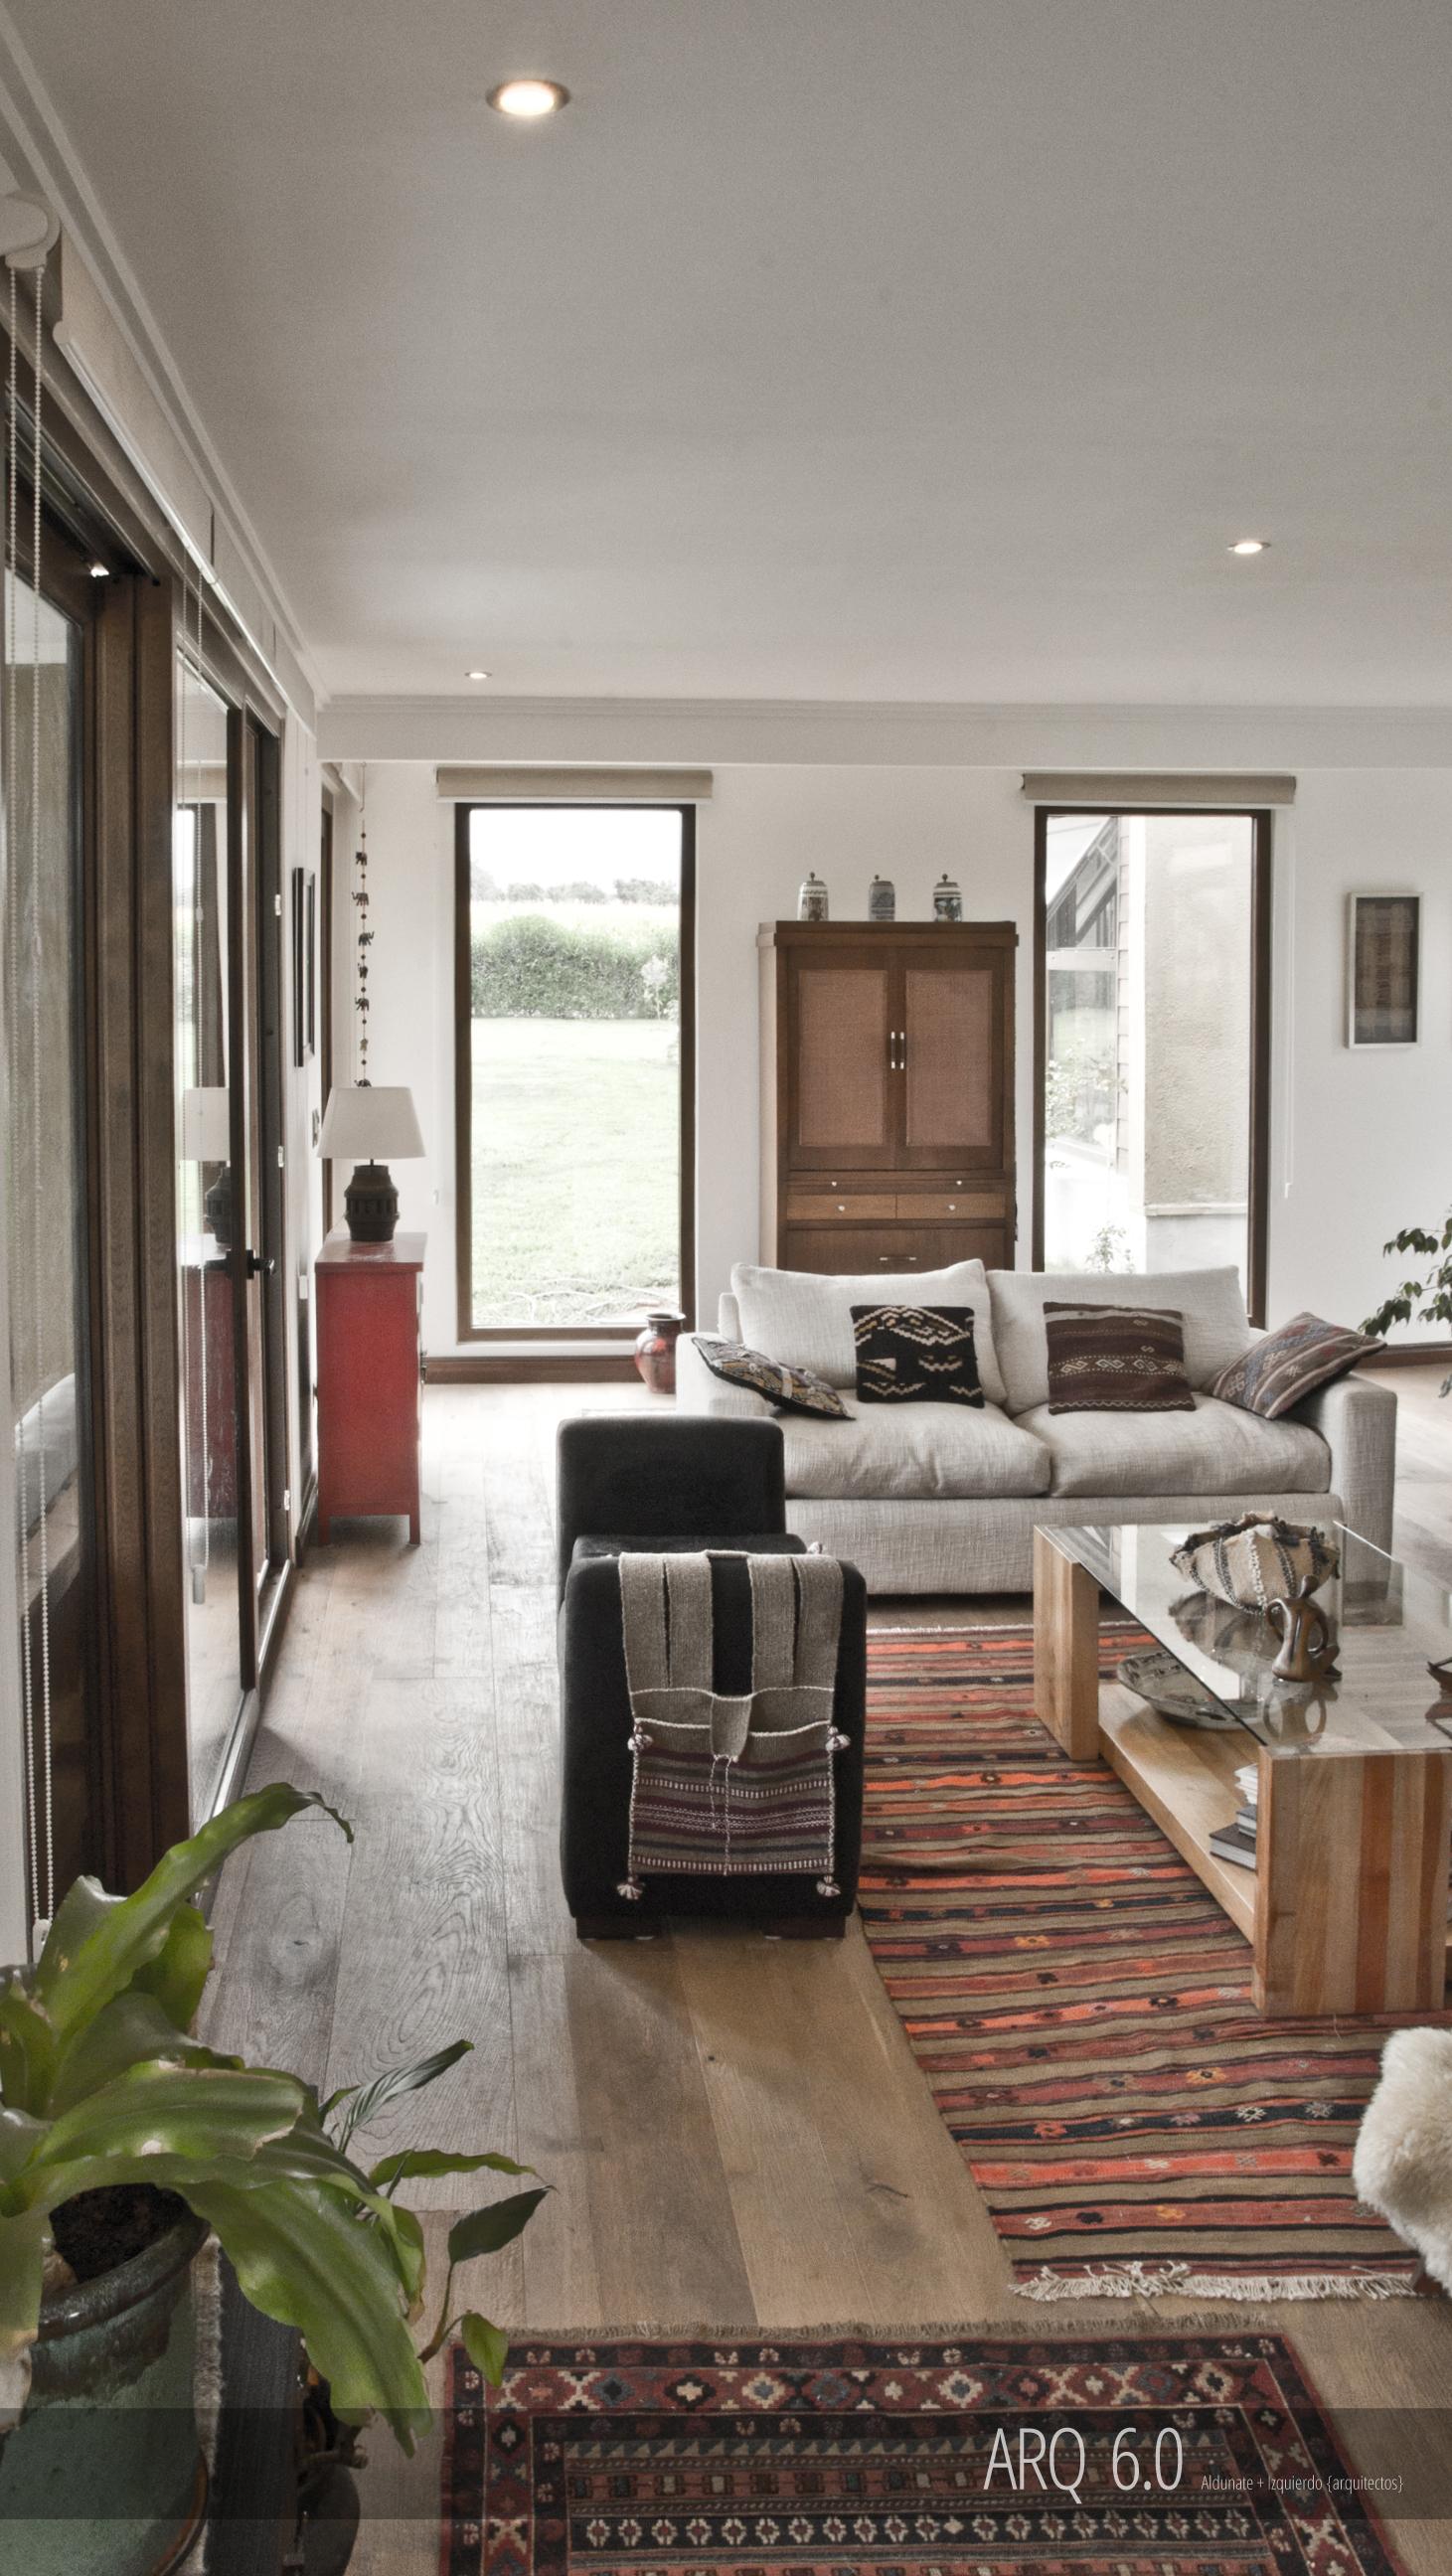 Arq6 - Casa Elzo Montero 40